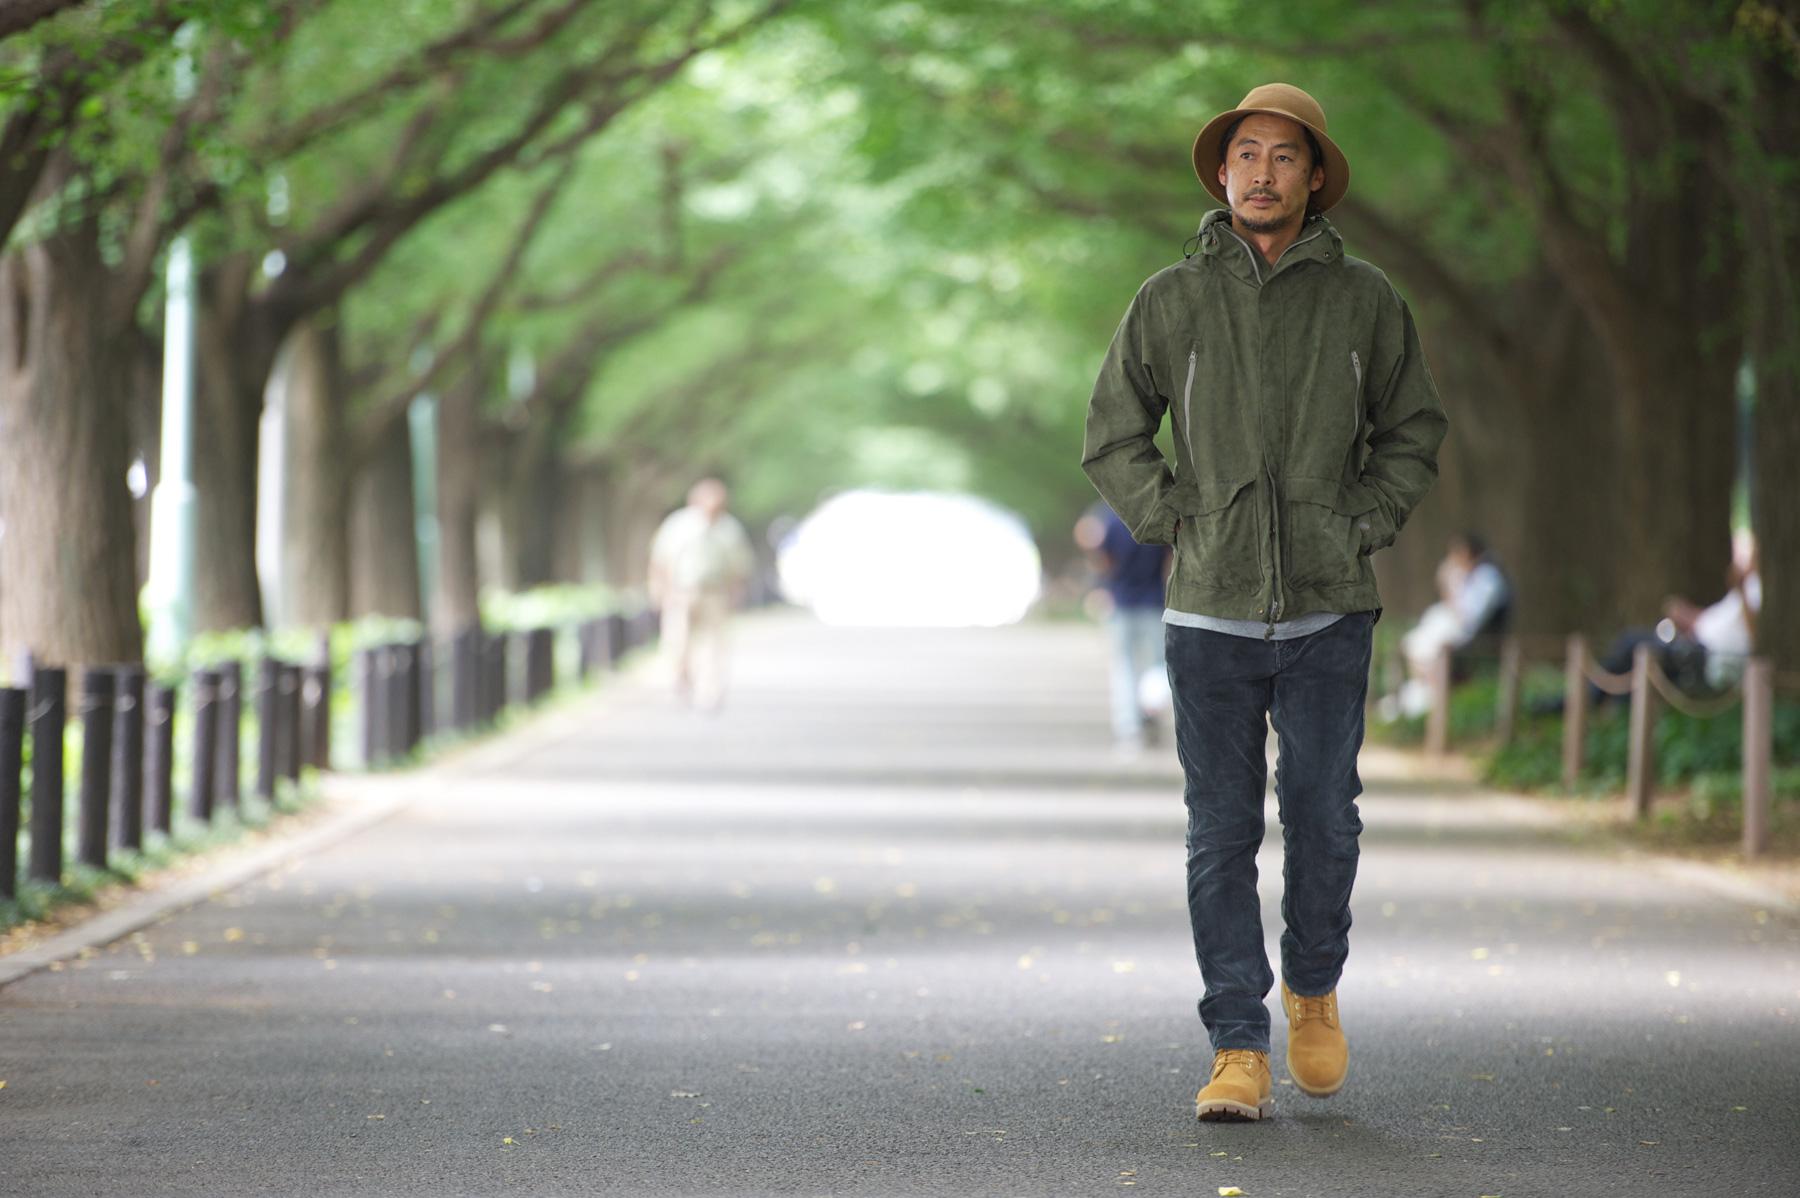 Timberland Mark Makers APAC: Washizu from Japan